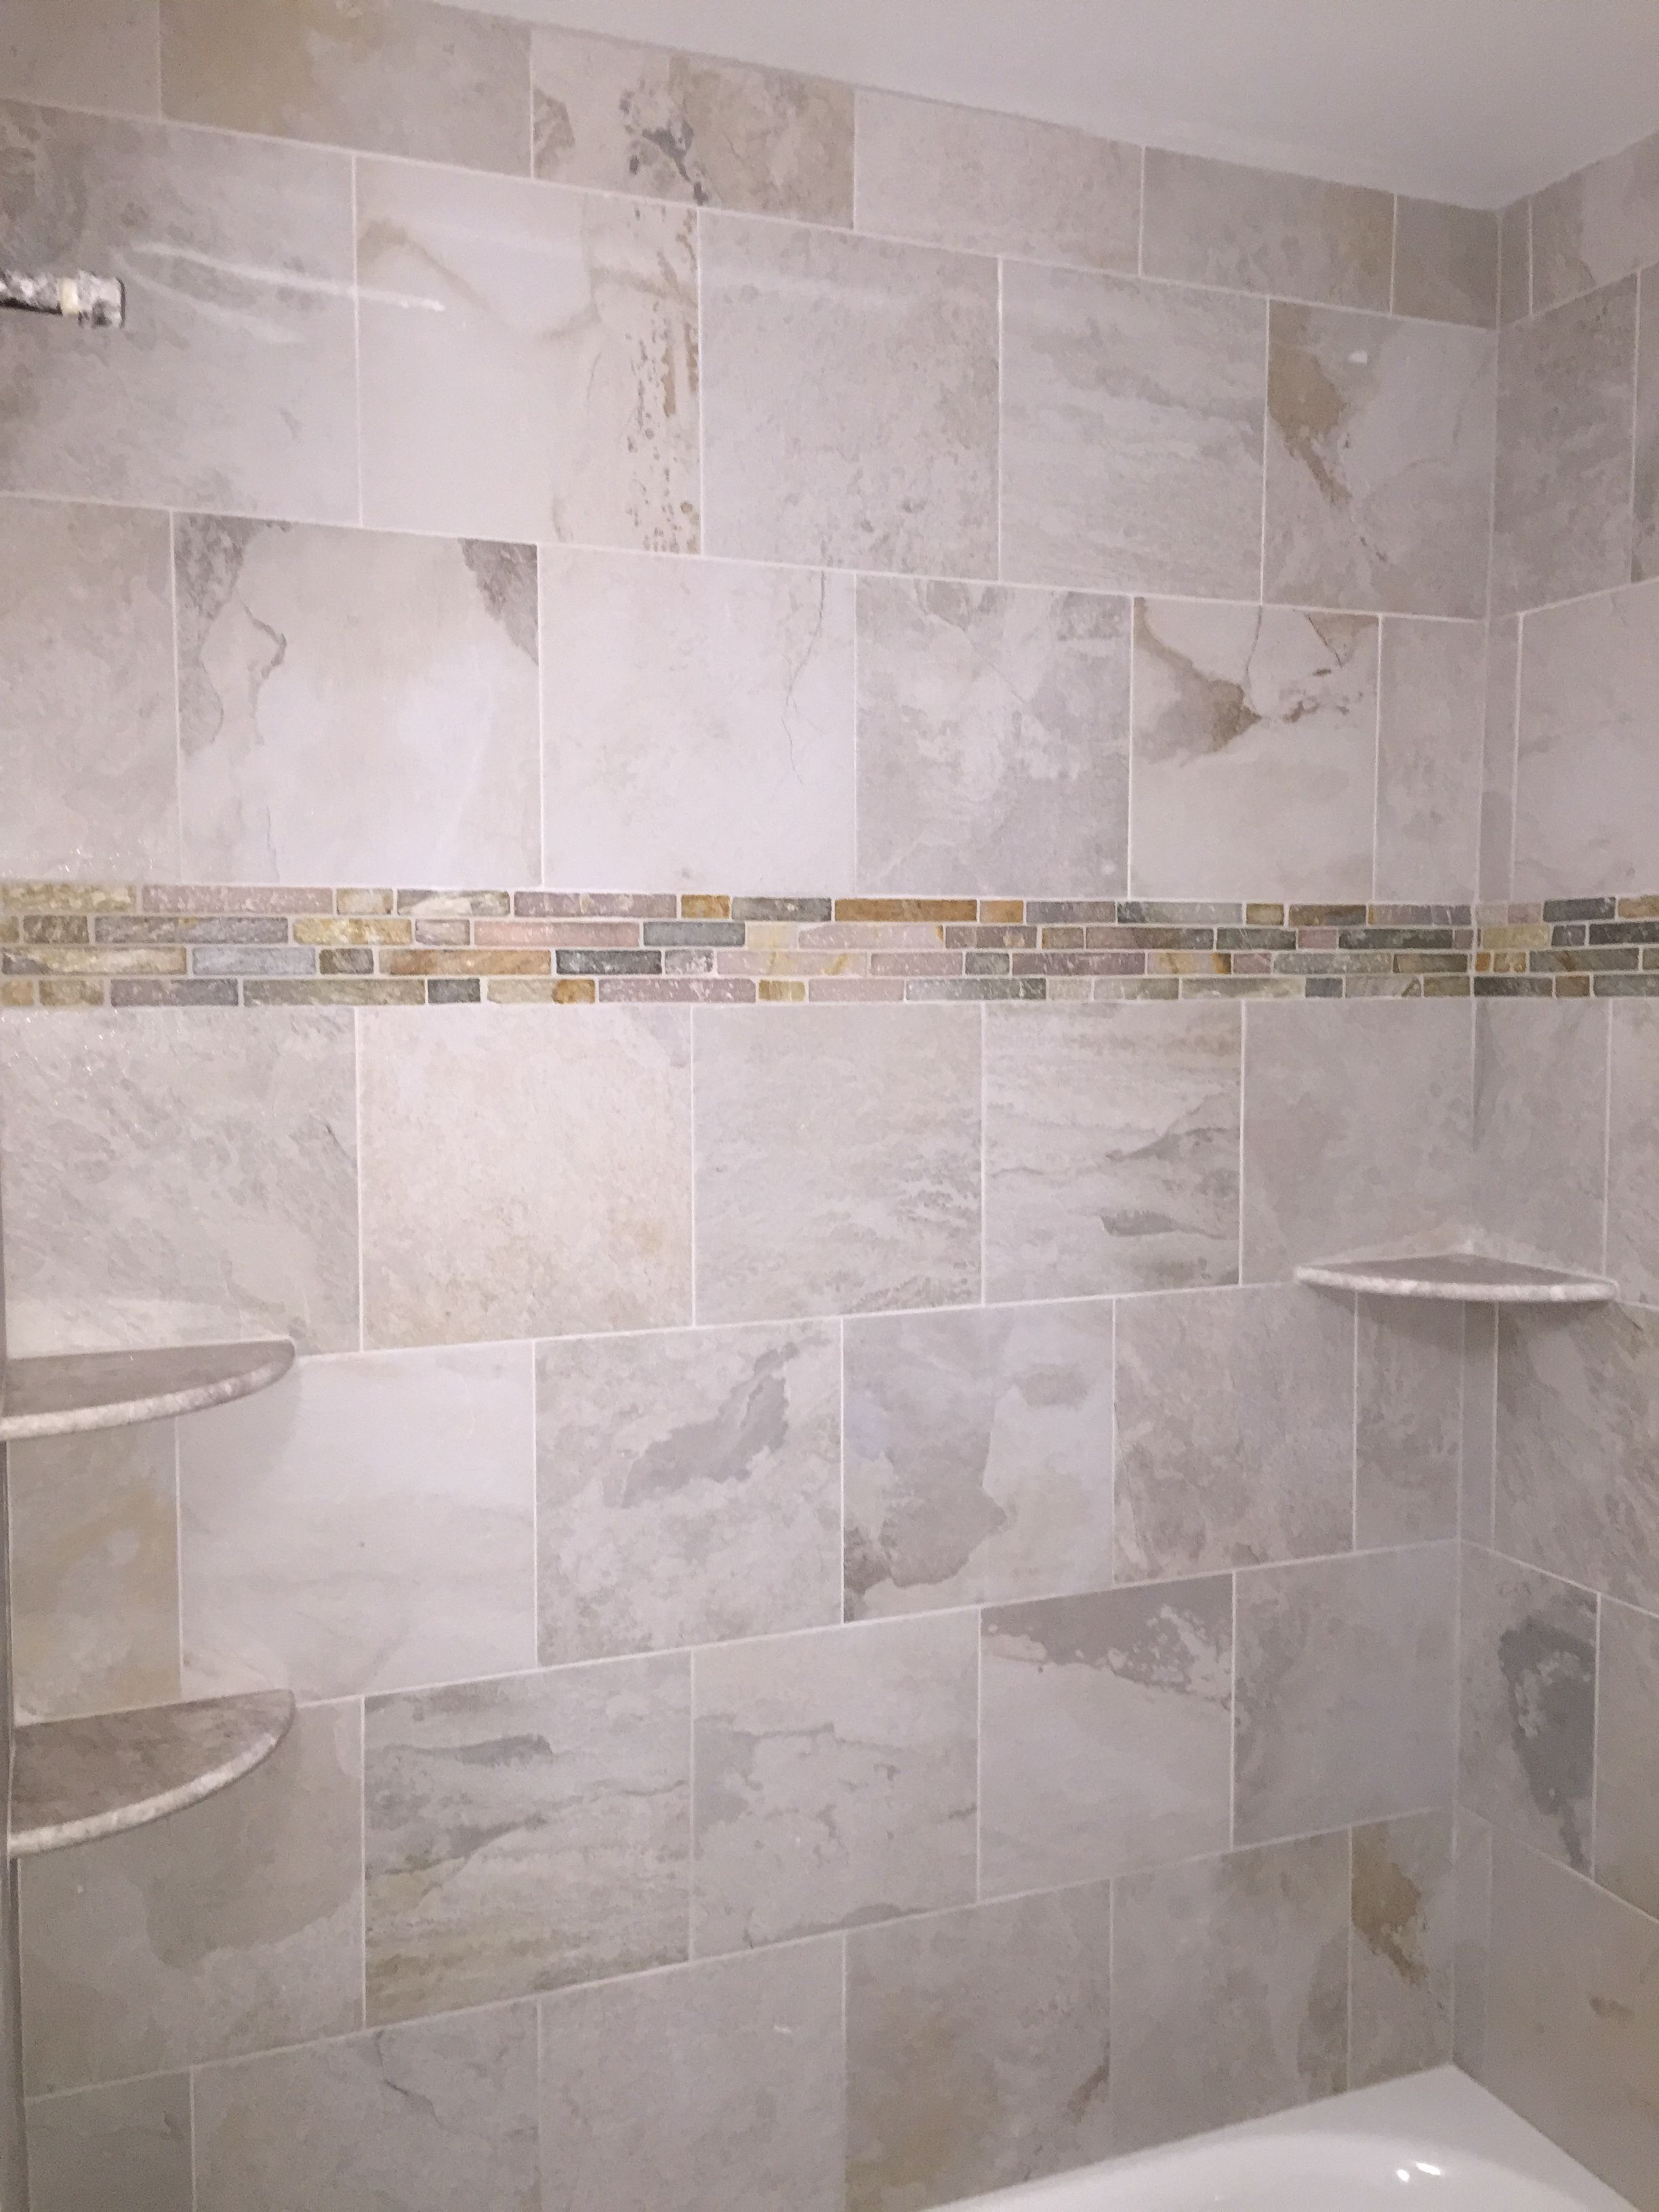 Ivetta White Tile Bathtub Surround Lowes Bathtub Tile Lowes